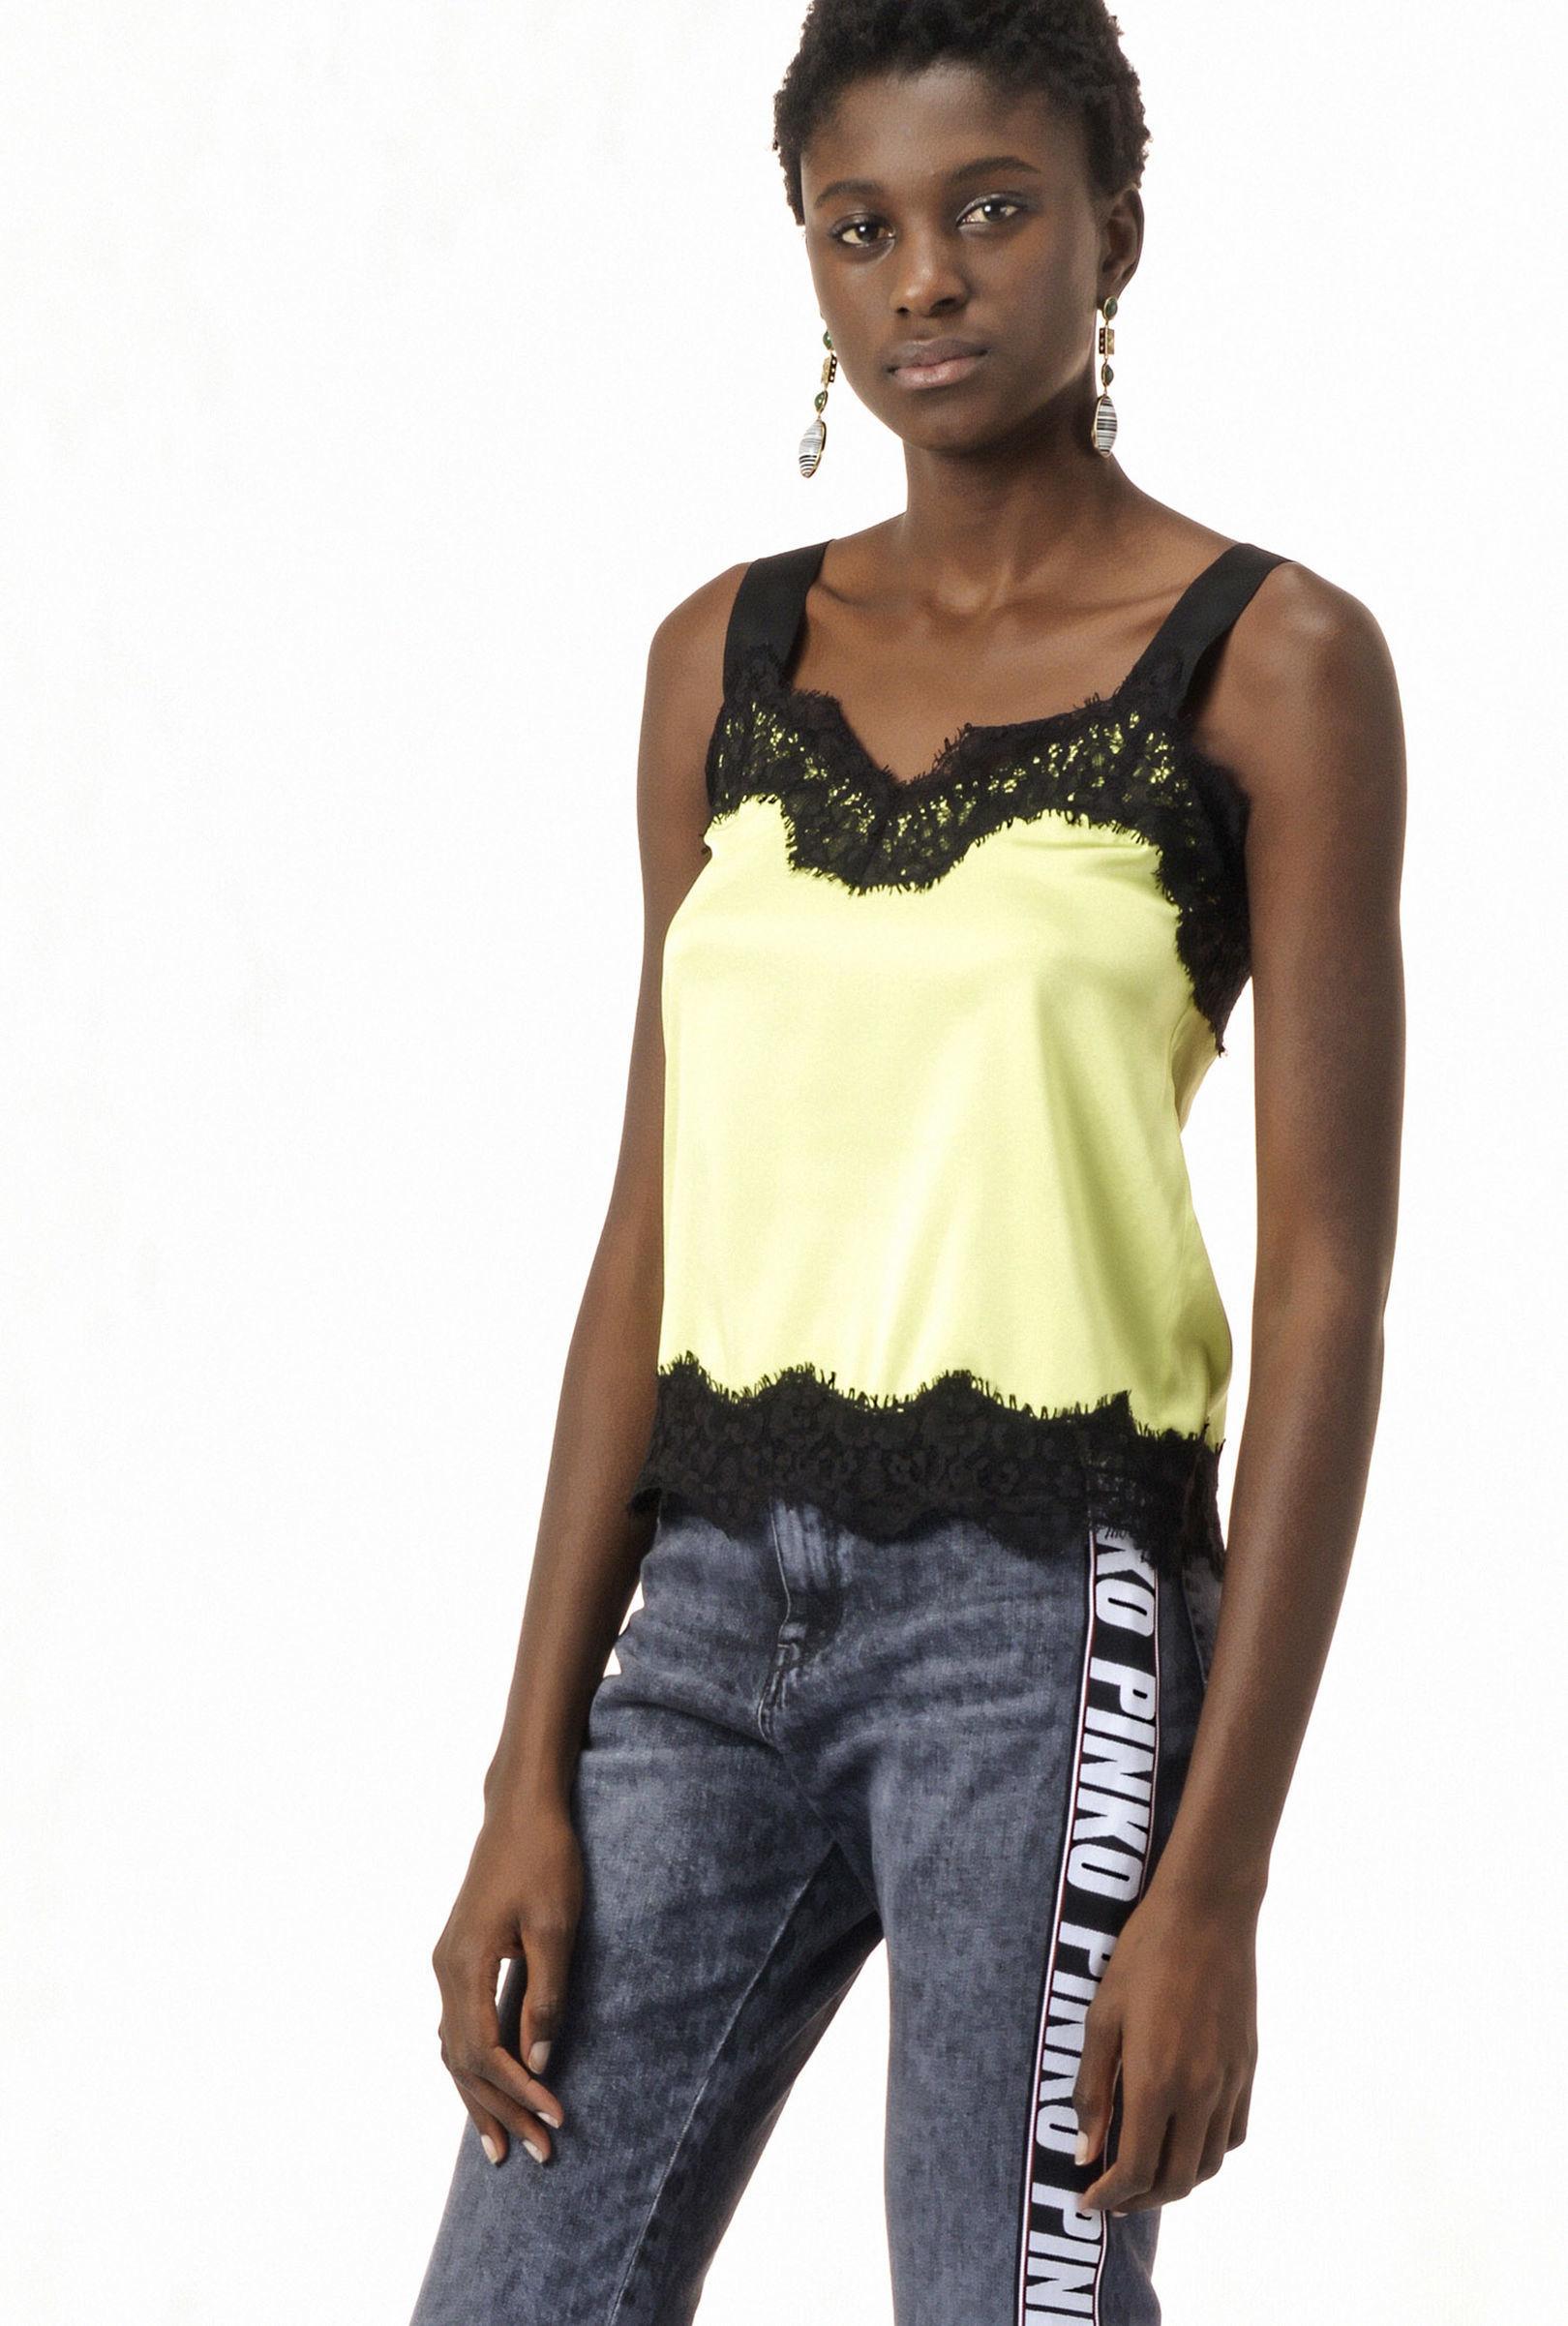 PINKO(ピンコ)  lace trimming  silk blouse1G12WM-Y443